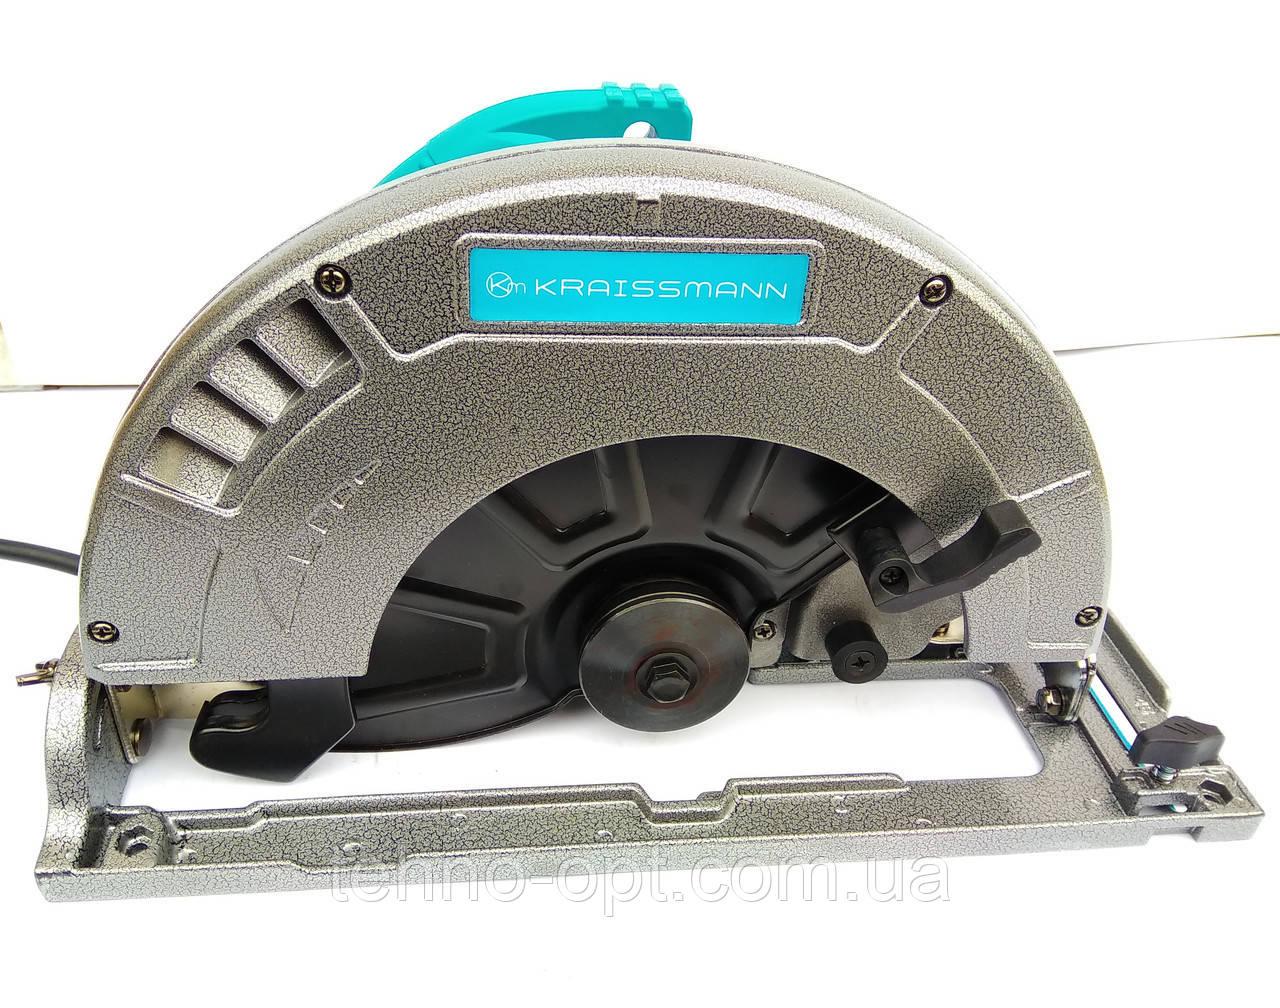 Пили дисковая KRAISSMANN 2400 Вт  KS-255 ( паркетка, циркулярка )